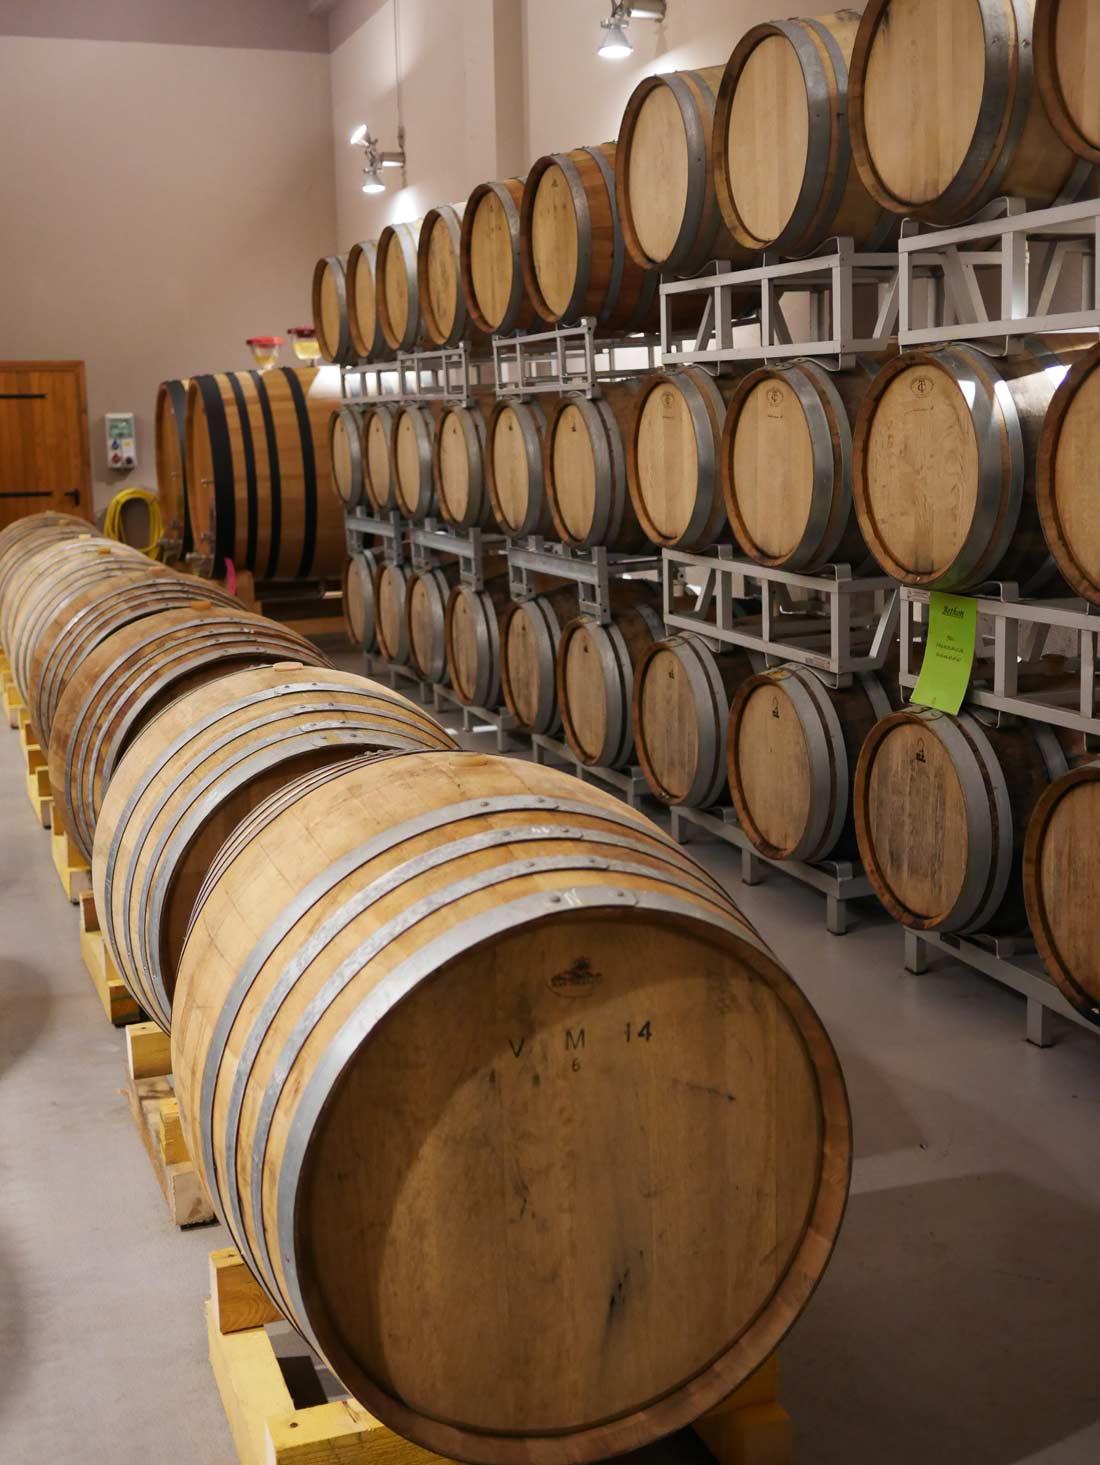 cellier de stockage Le Brun de Neuville